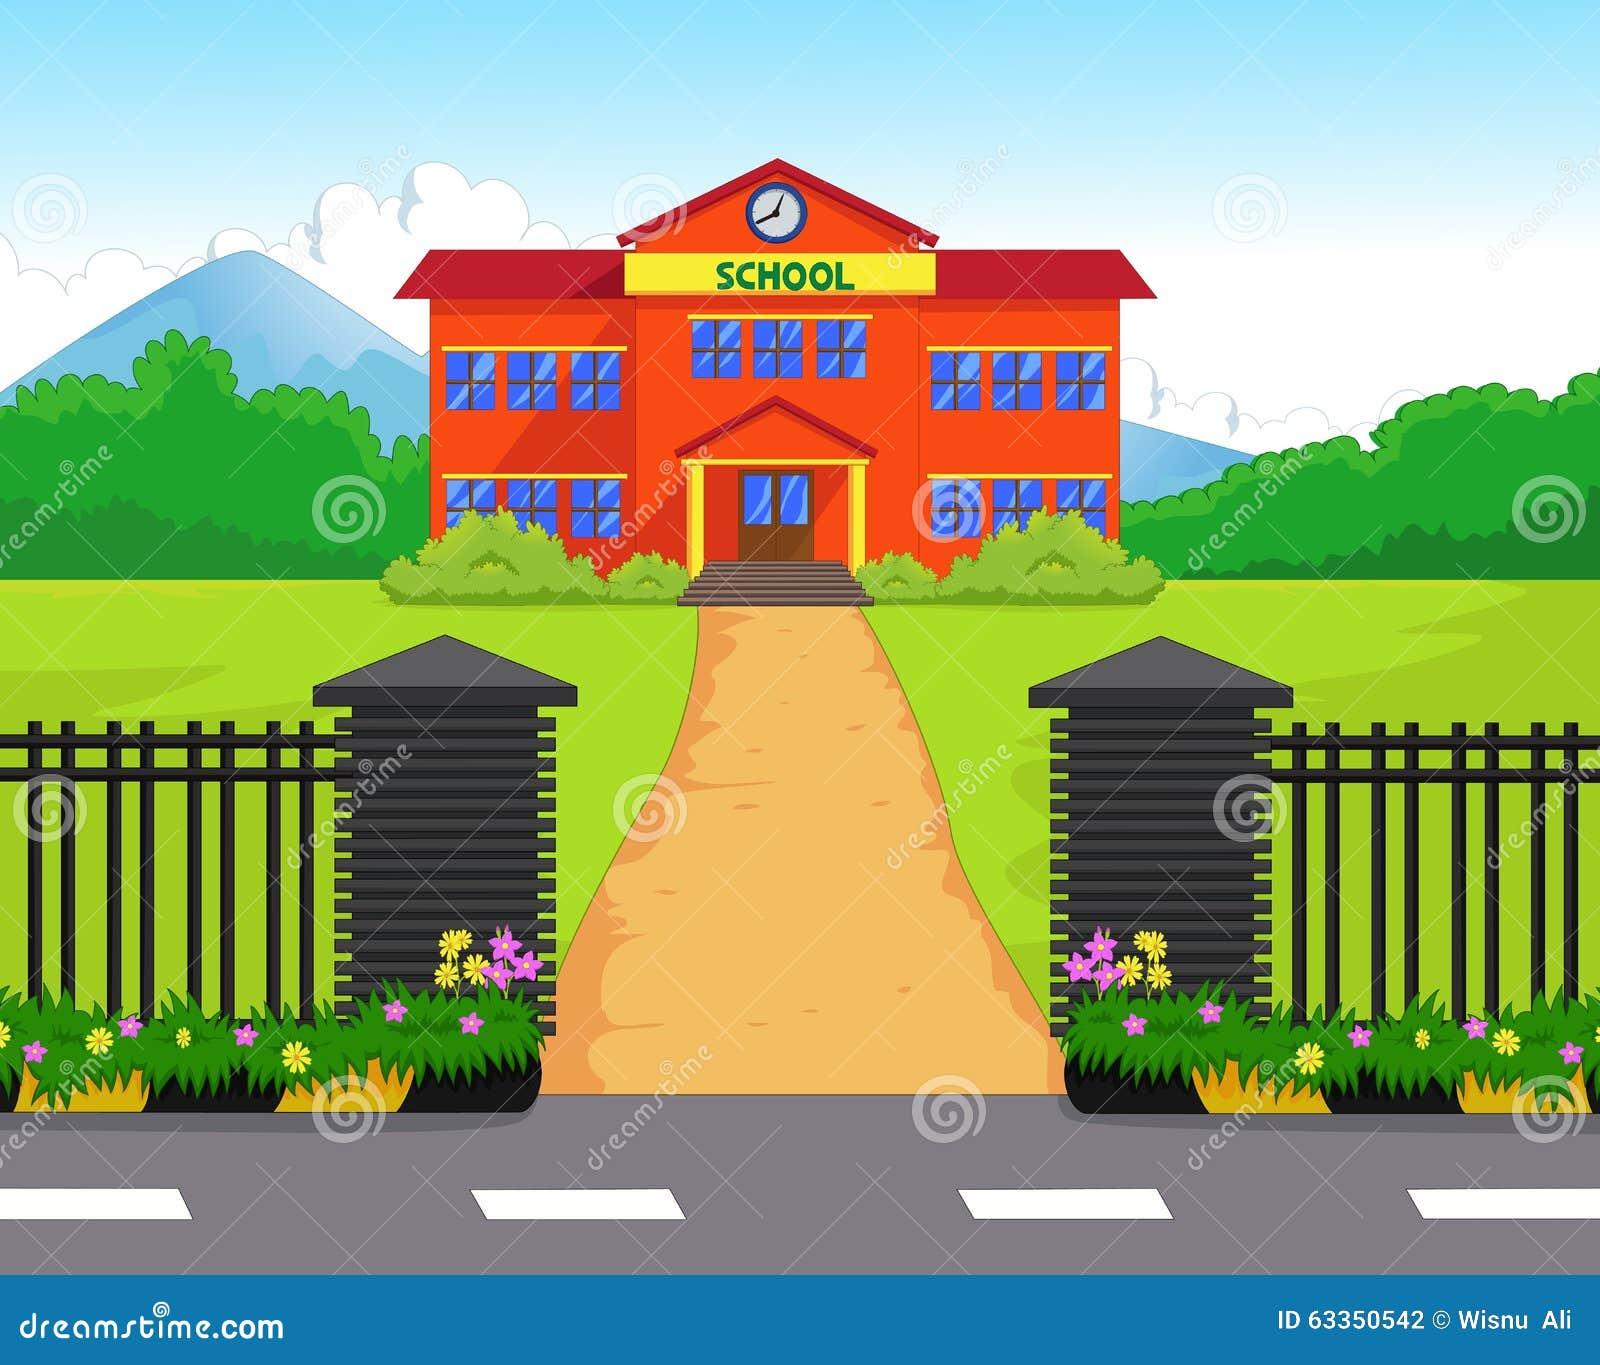 Cartoon School Building With Green Yard Stock Vector - Image: 63350542